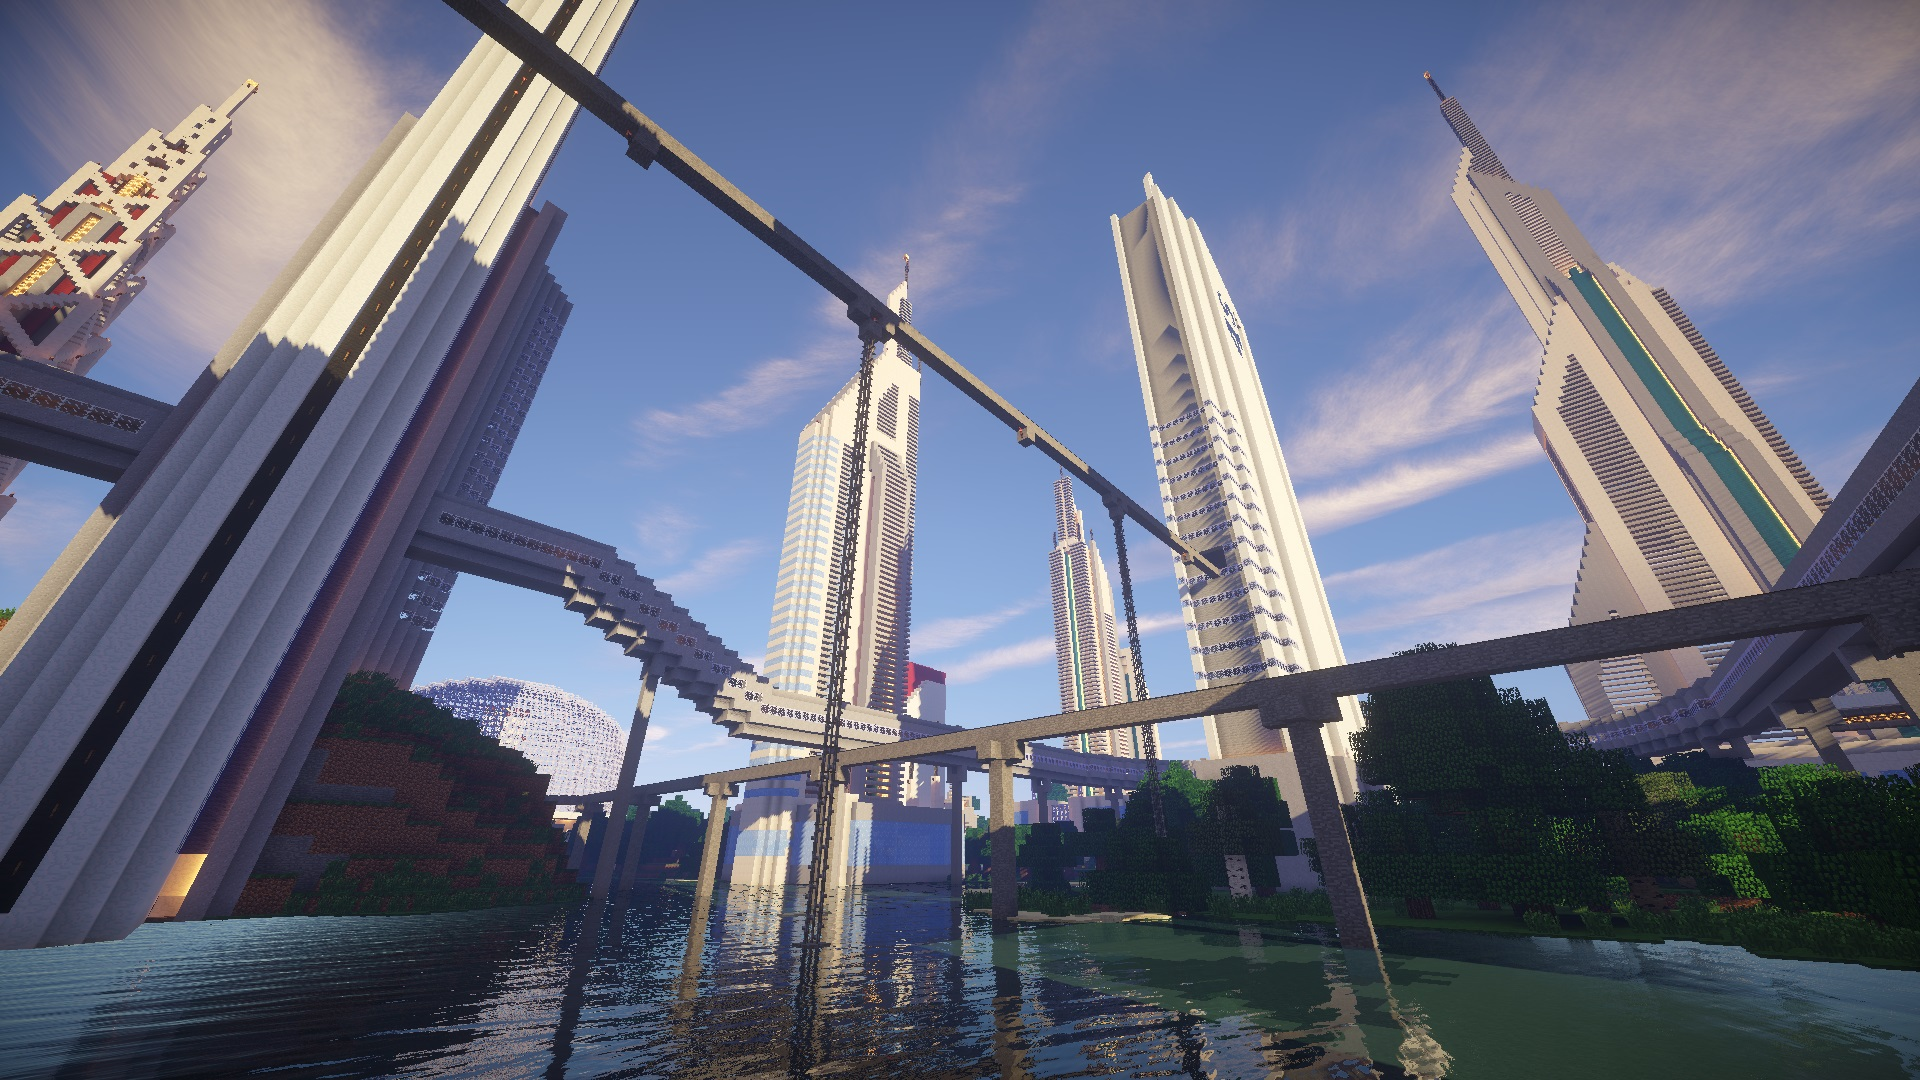 Future City / Город будущего v 3.4